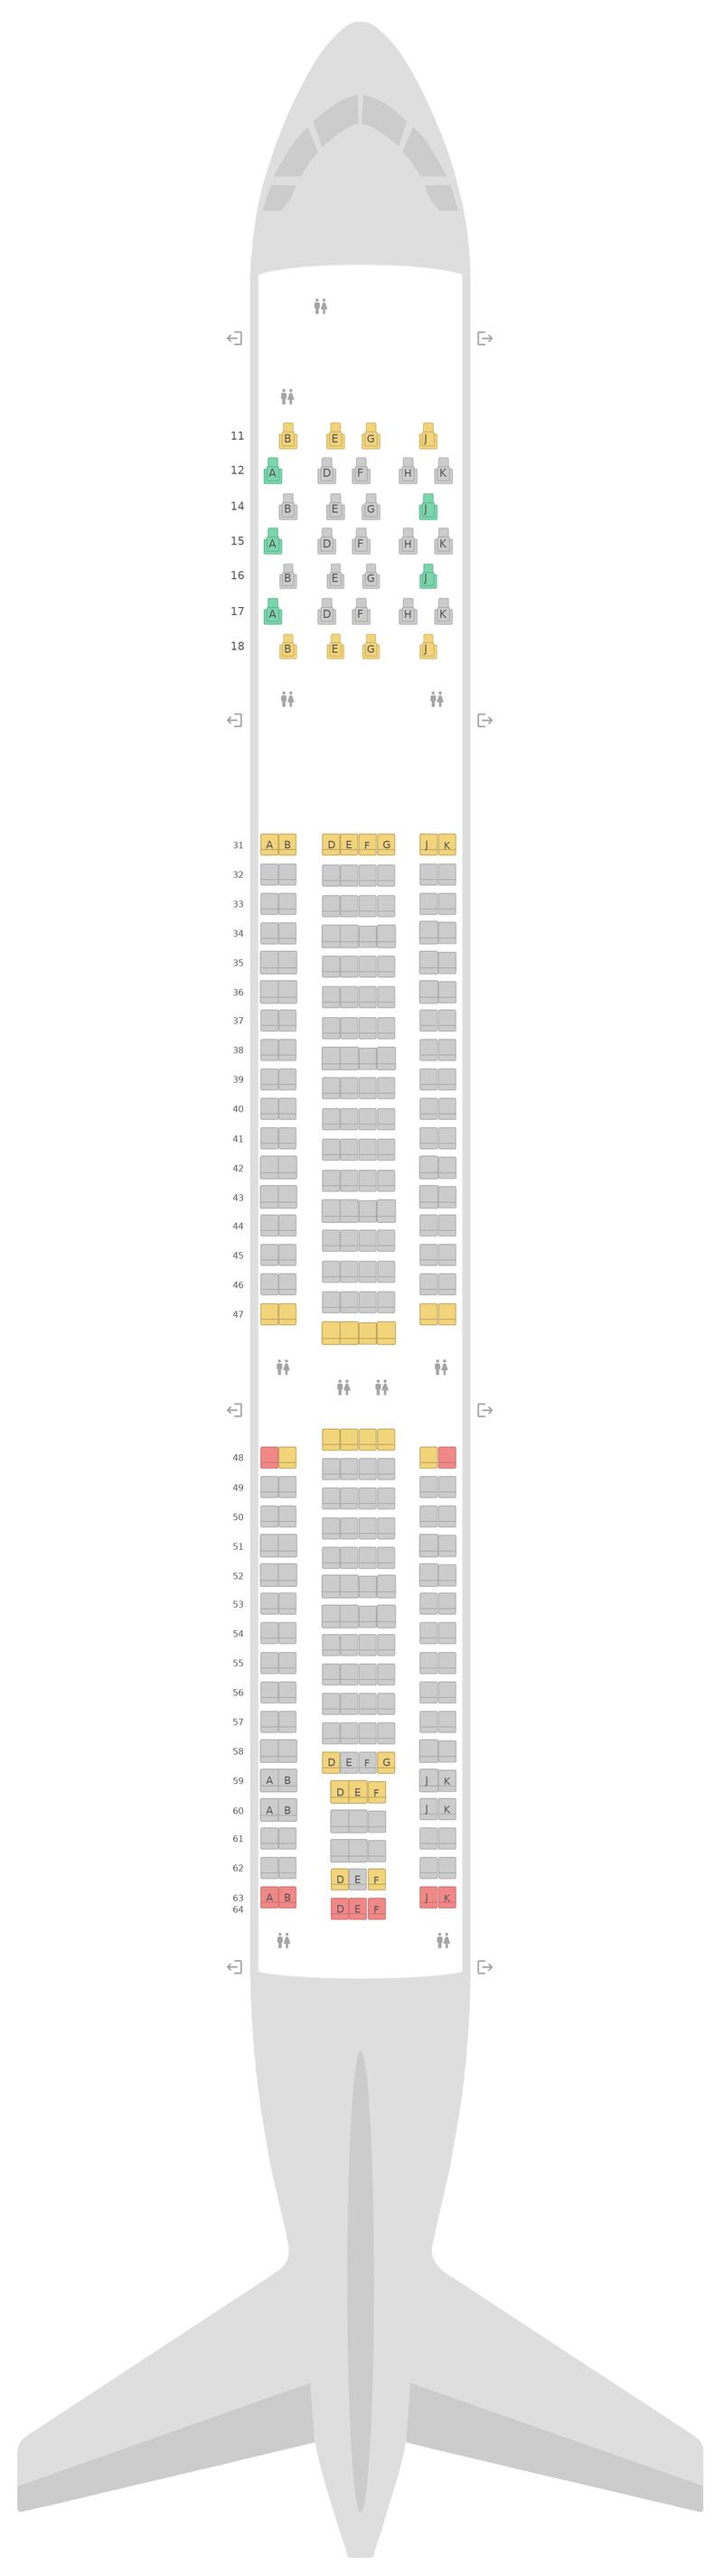 Seat Map Thai Airways Airbus A330-300 (333) v1